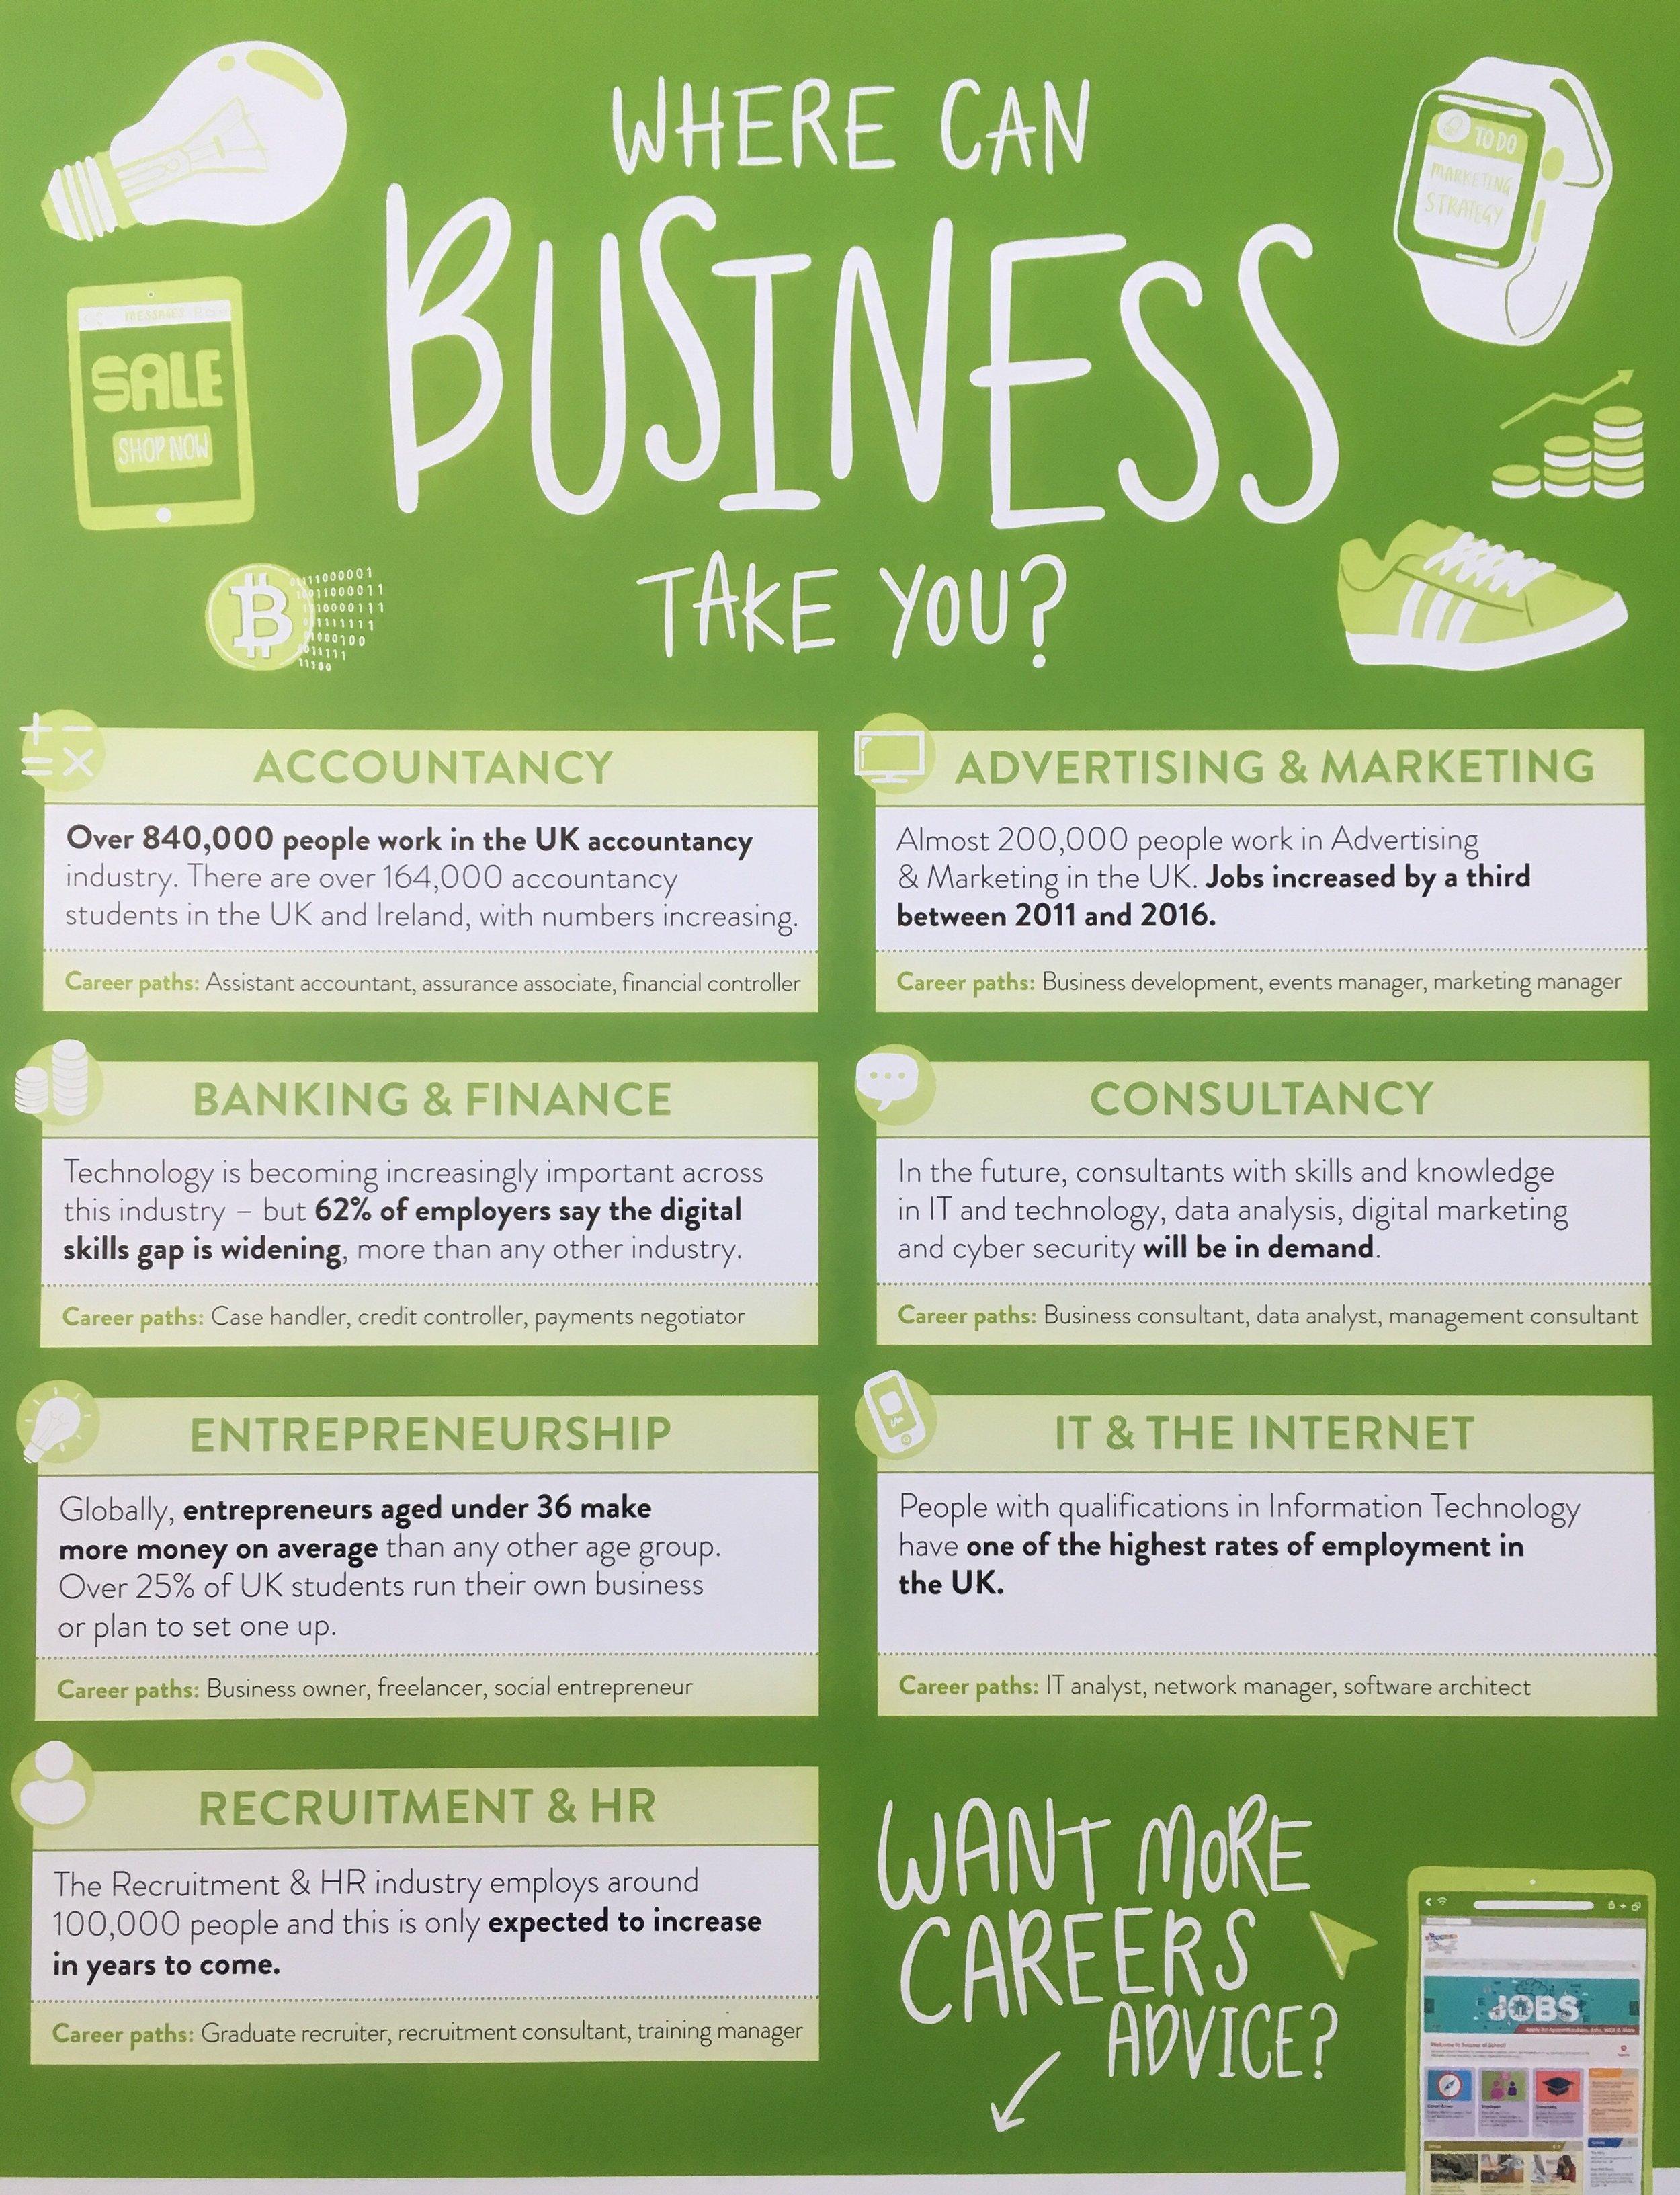 Business 2.jpg